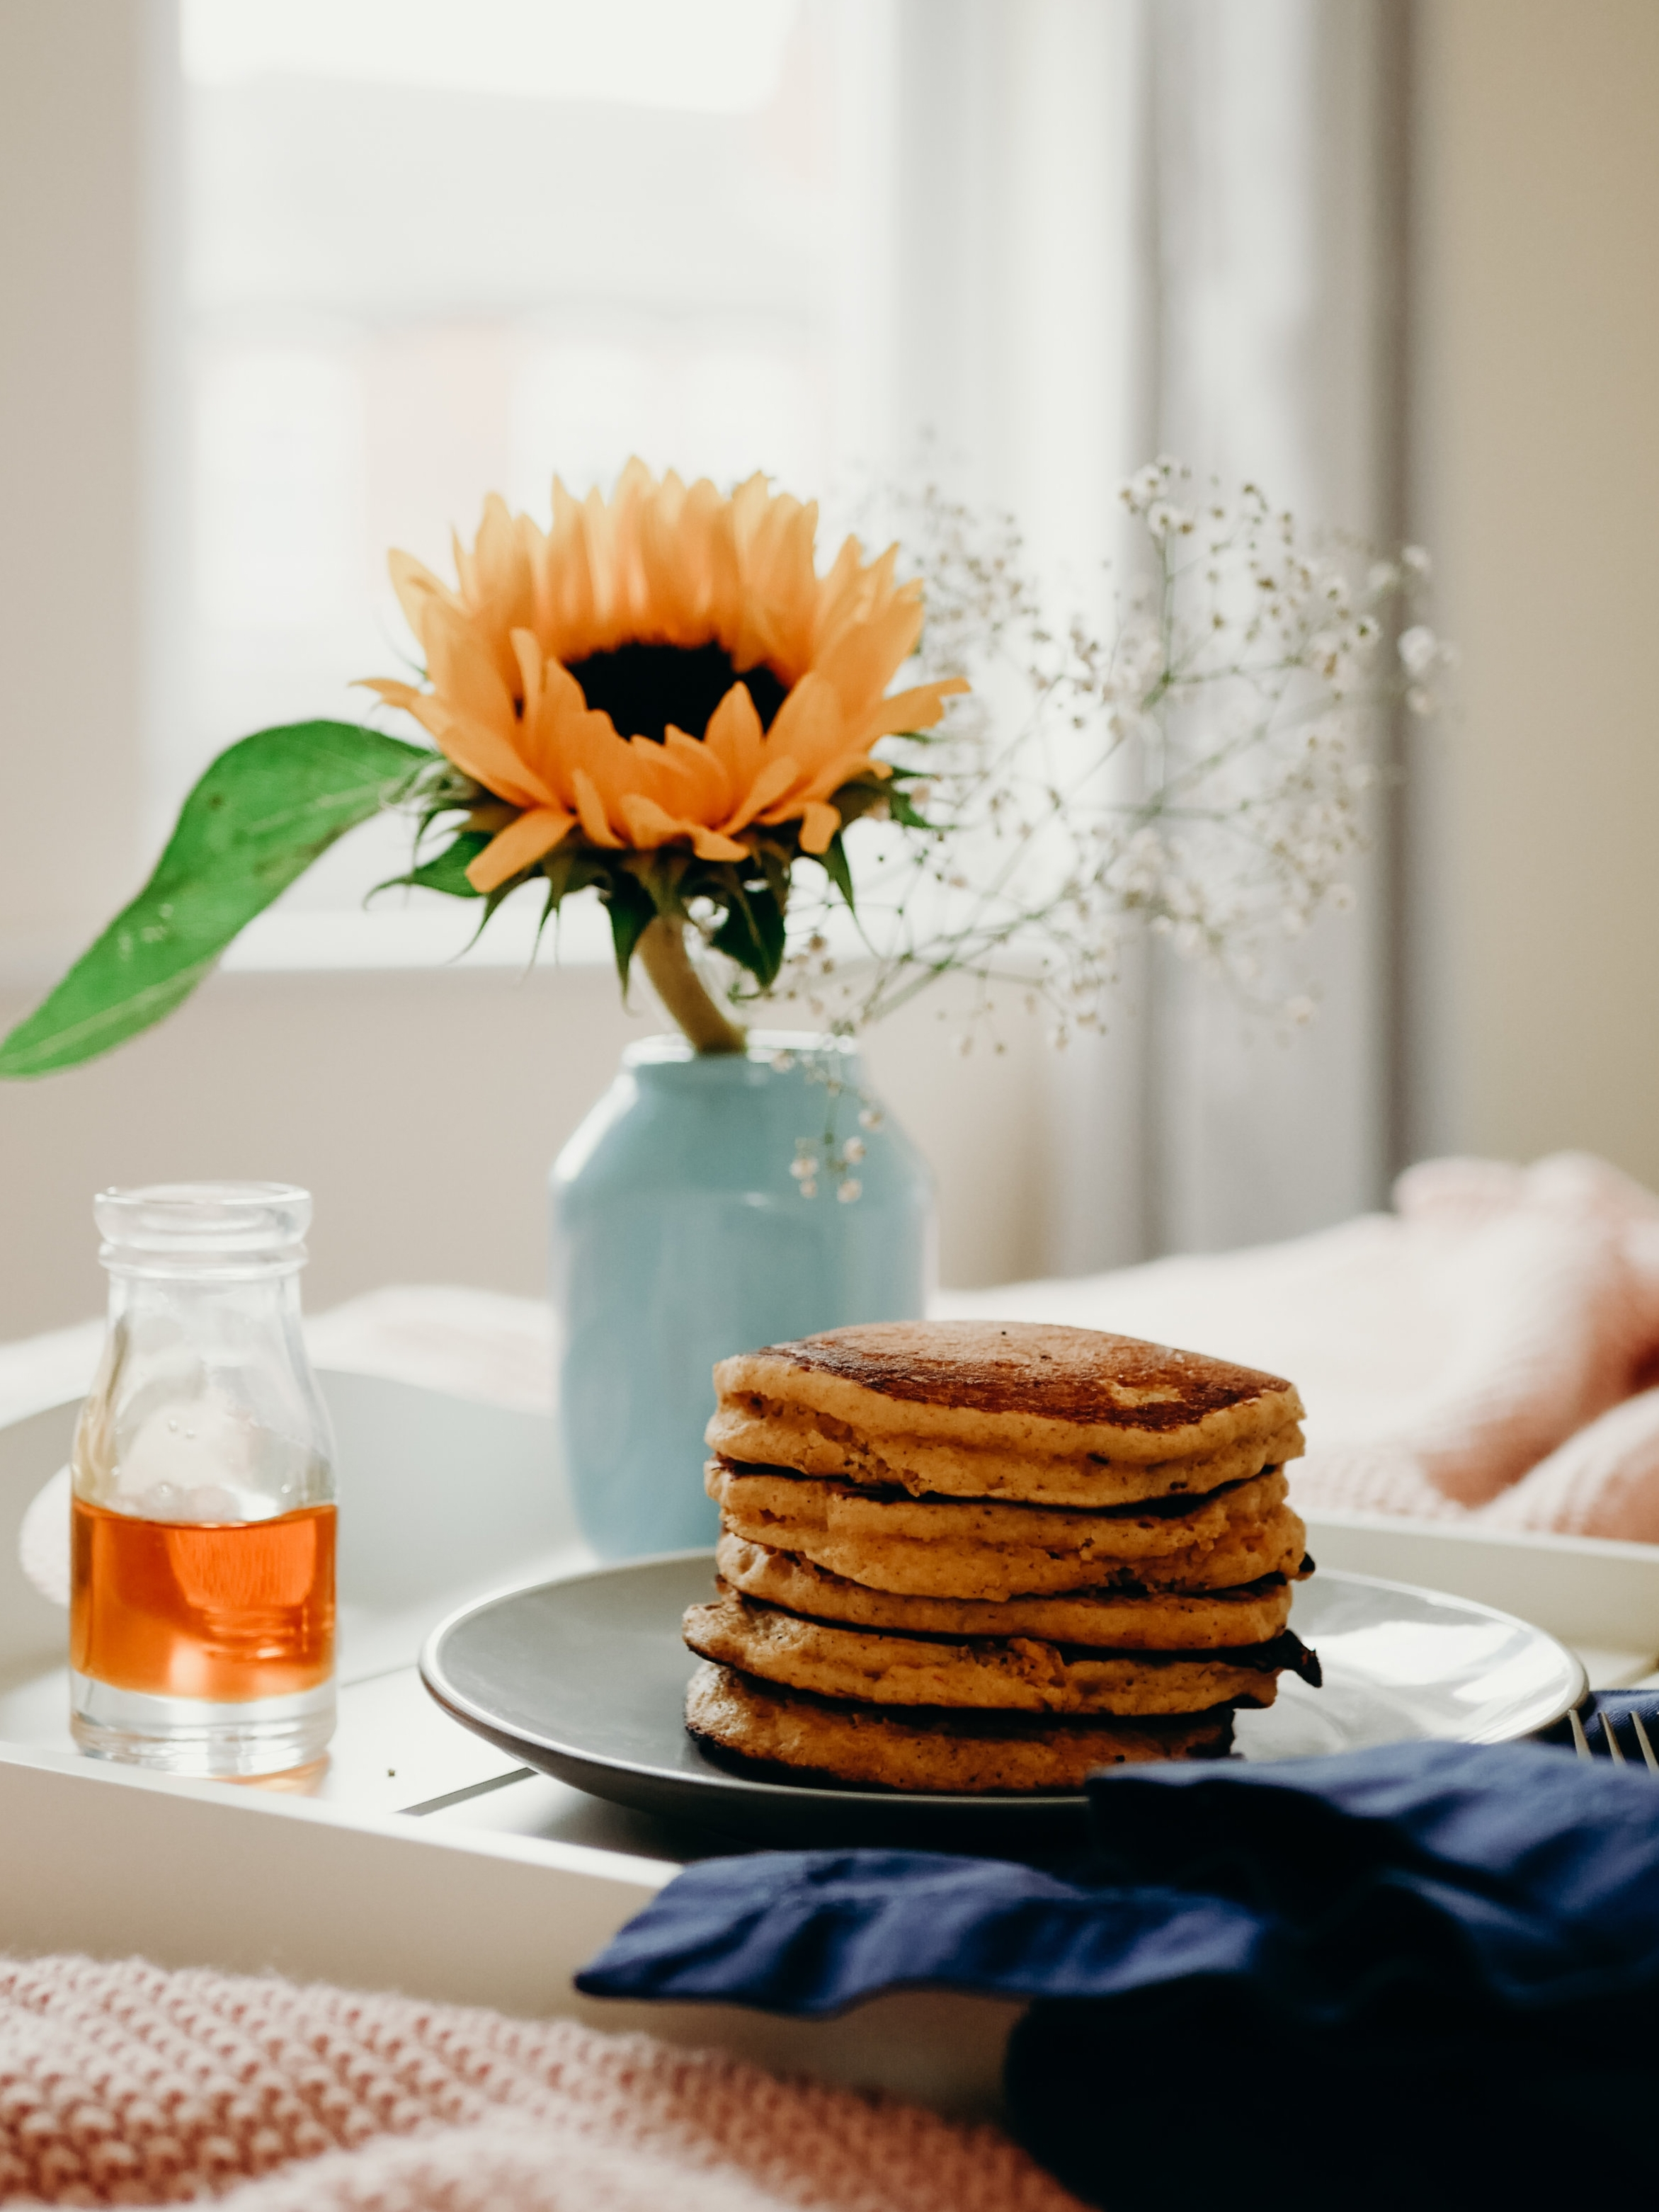 Breakfast in Bed with Trader Joe's Pumpkin Pancakes